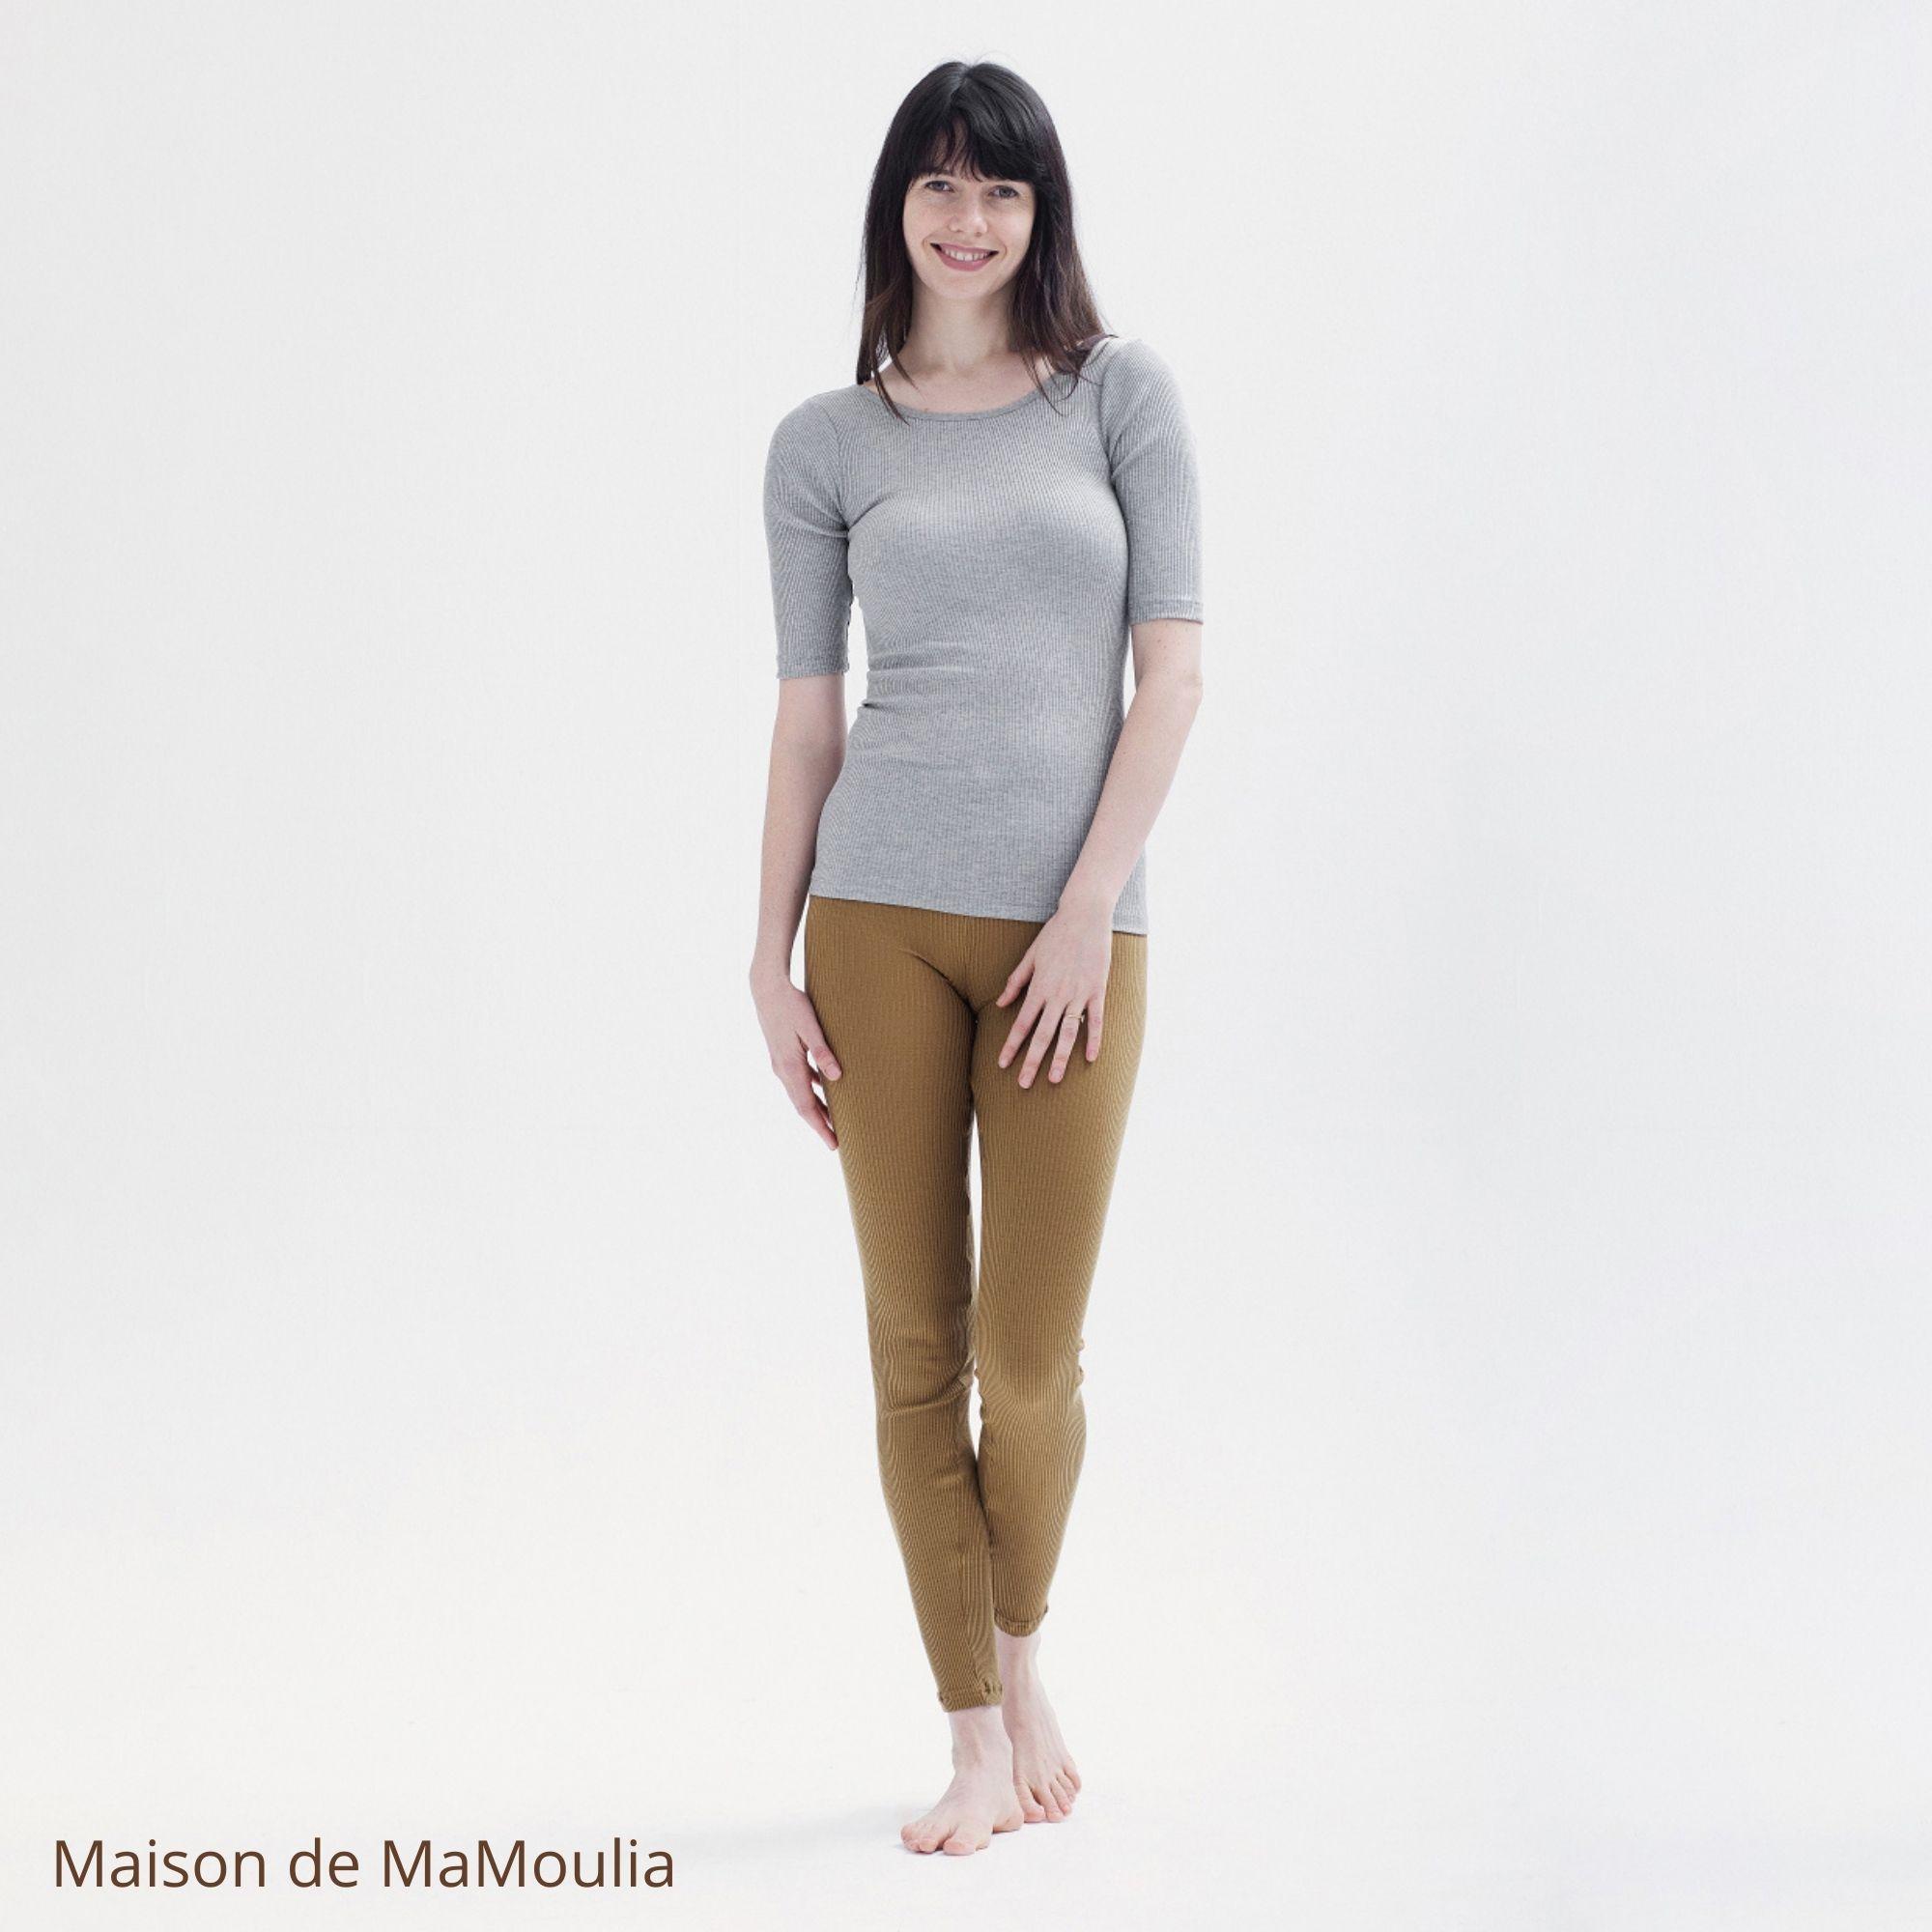 MINIMALISMA - Legging femme - Soie 70% / coton 30% - Great - Seaweed